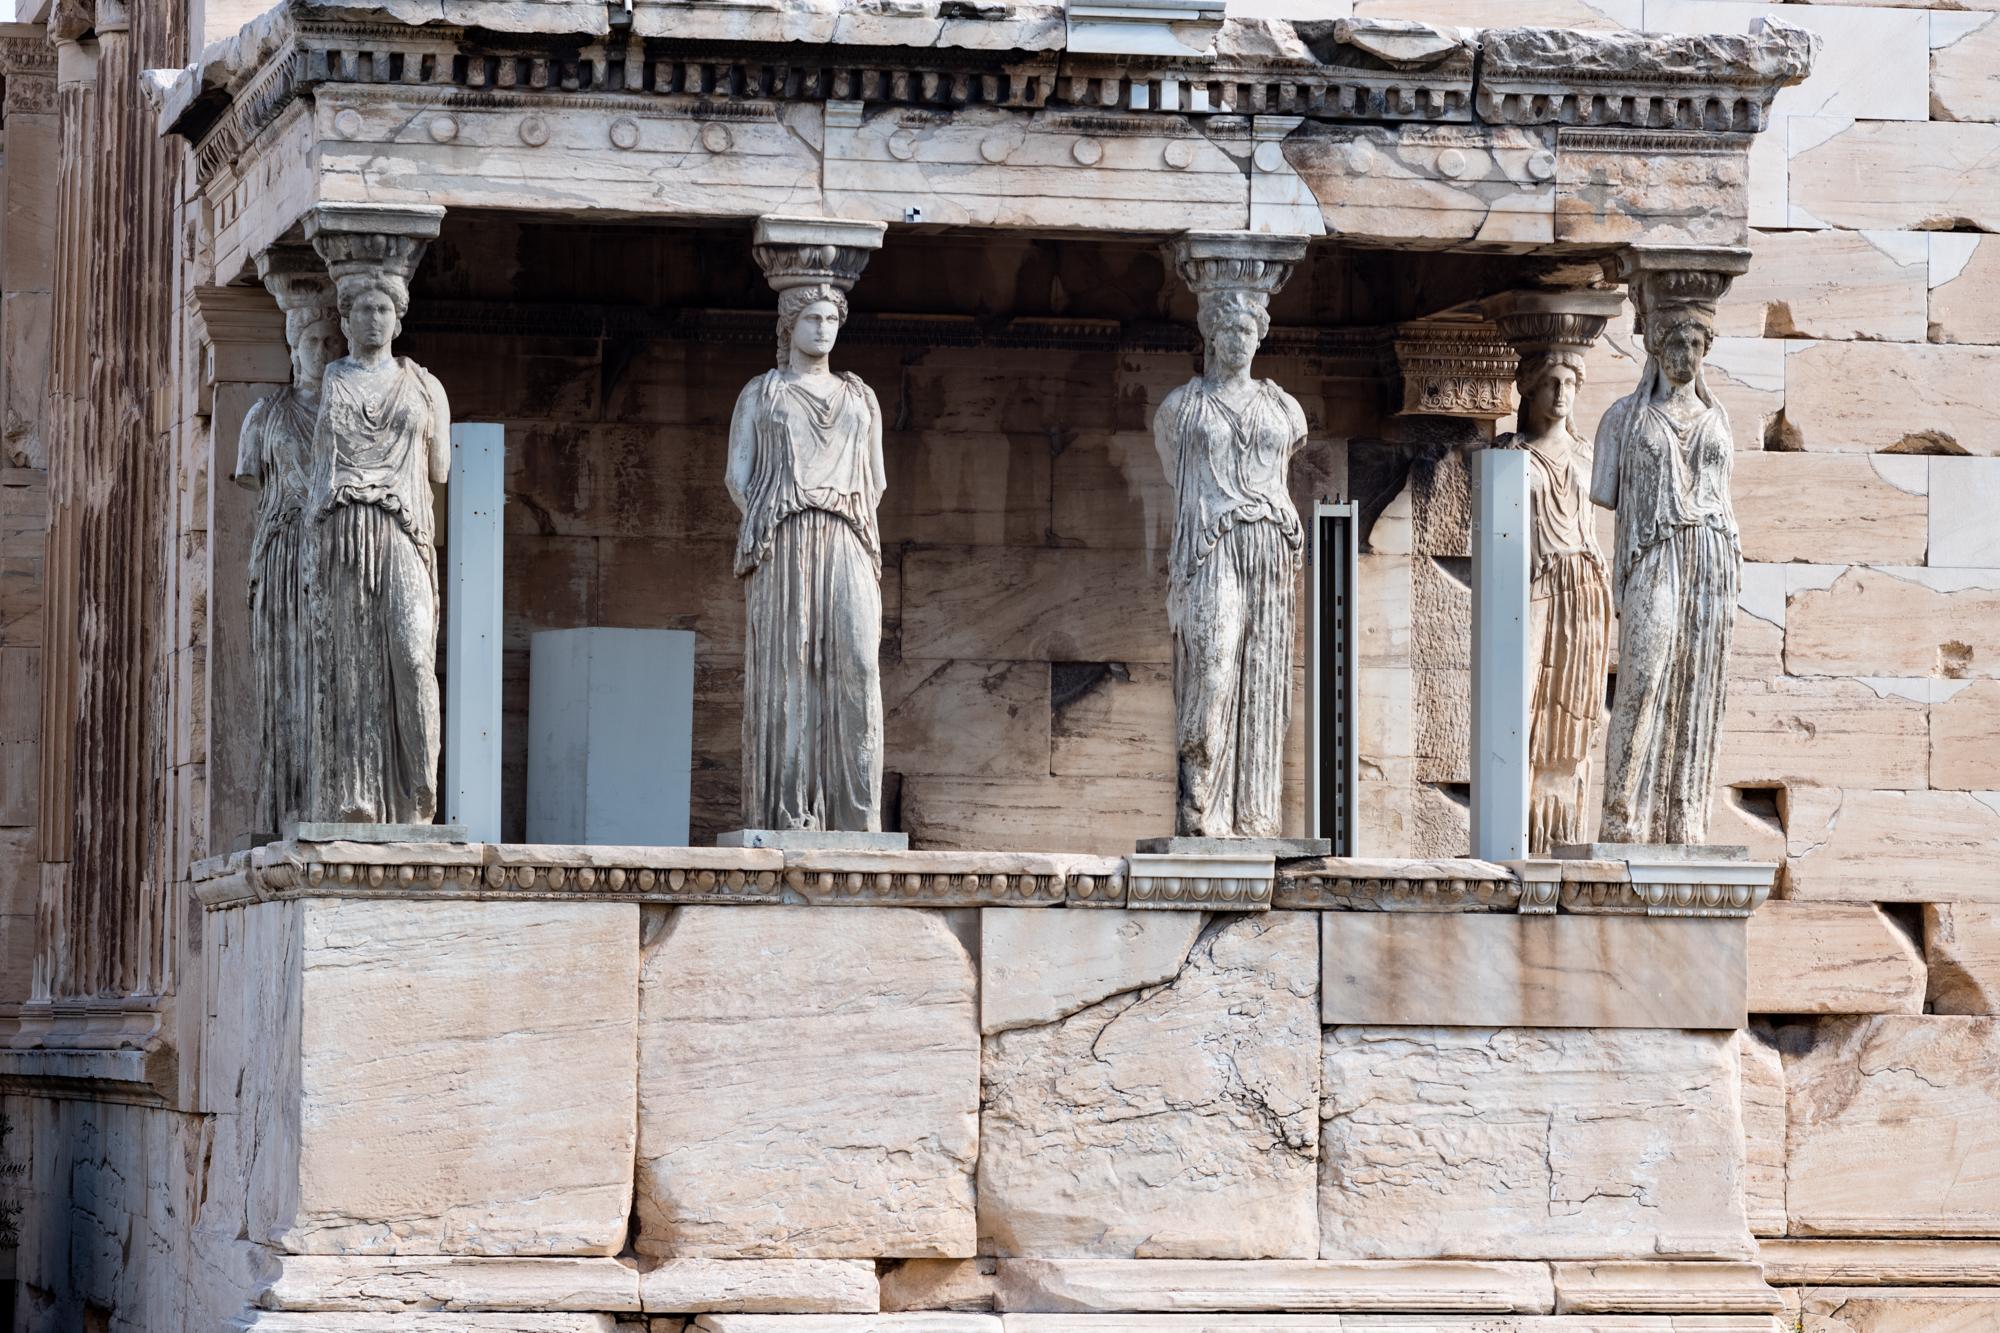 The Erechtheum on the Acropolis